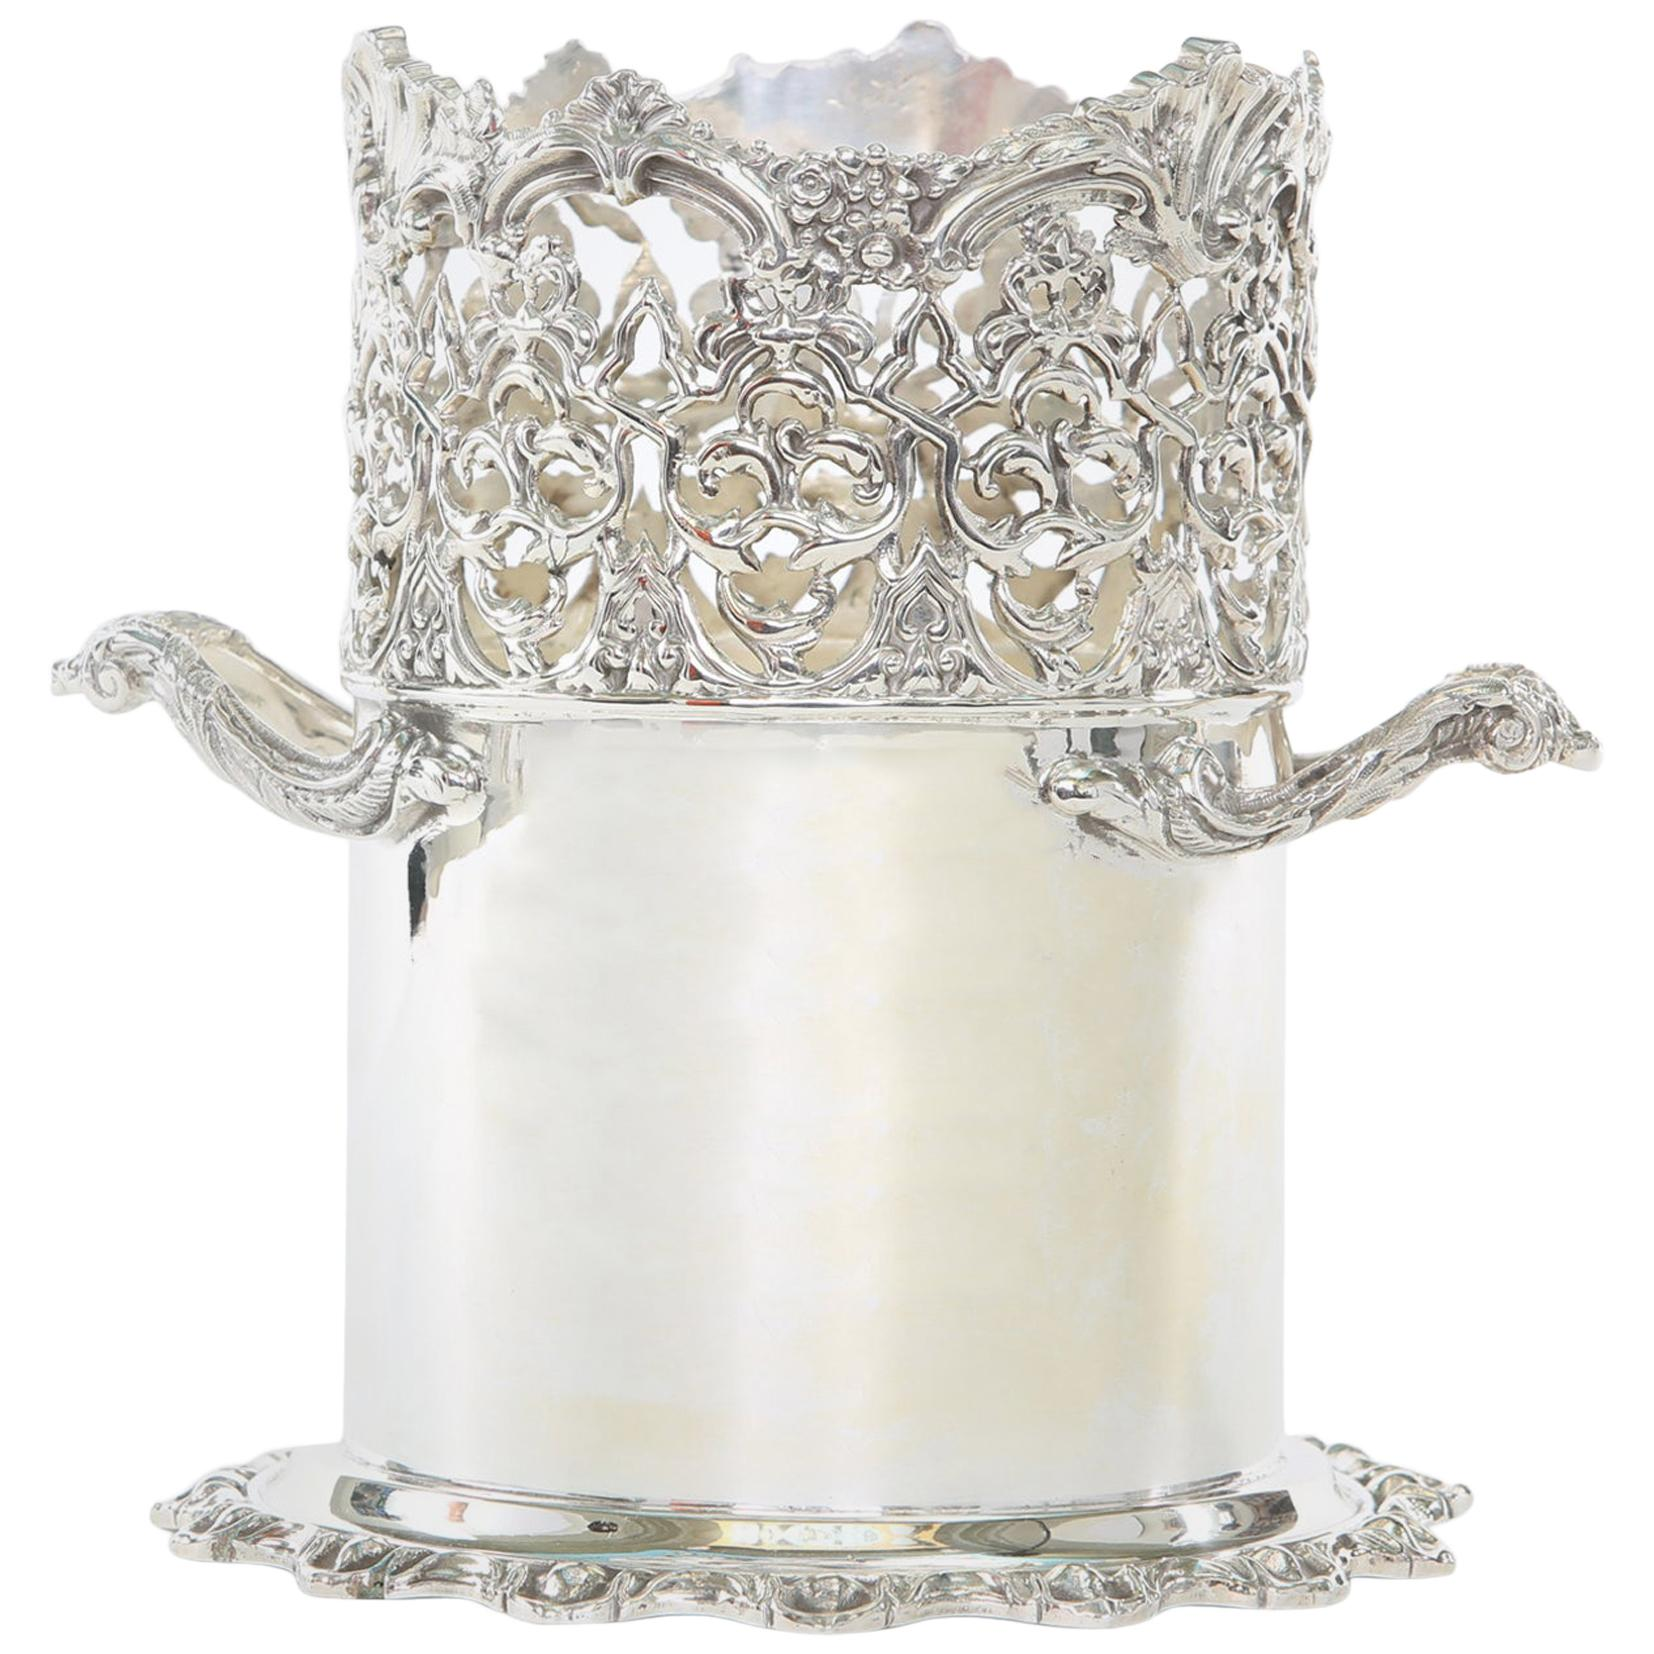 English Silver Plate Barware Bottle Holder